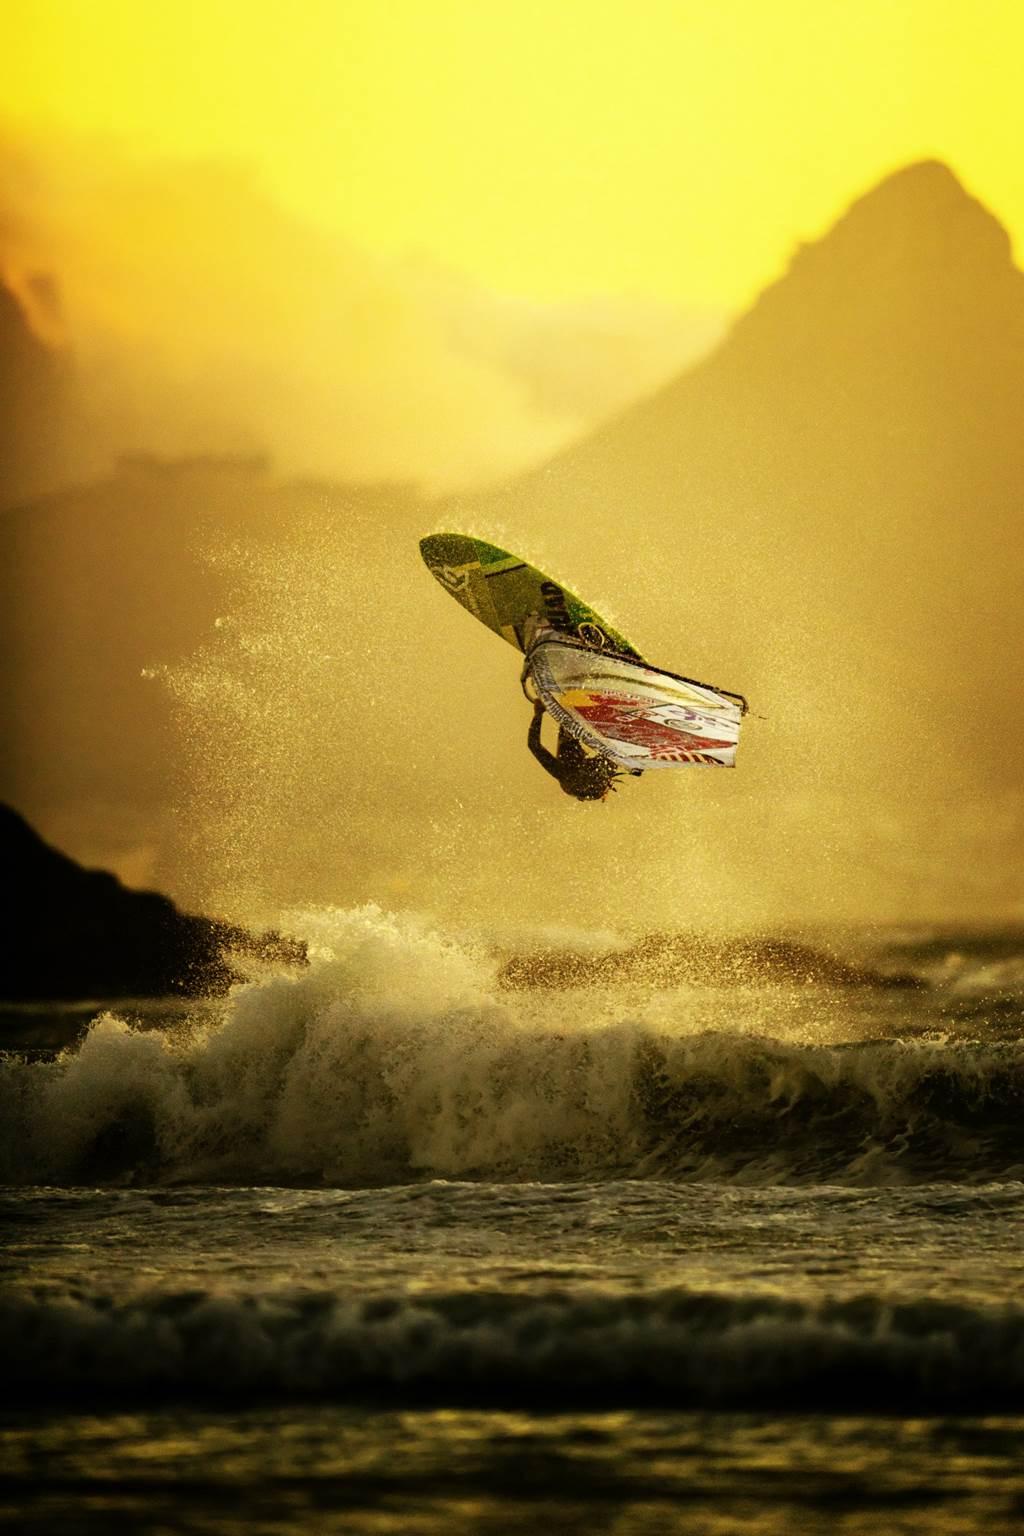 Valahol Dél-Afrika vizein Forrás: Red Bull Media House